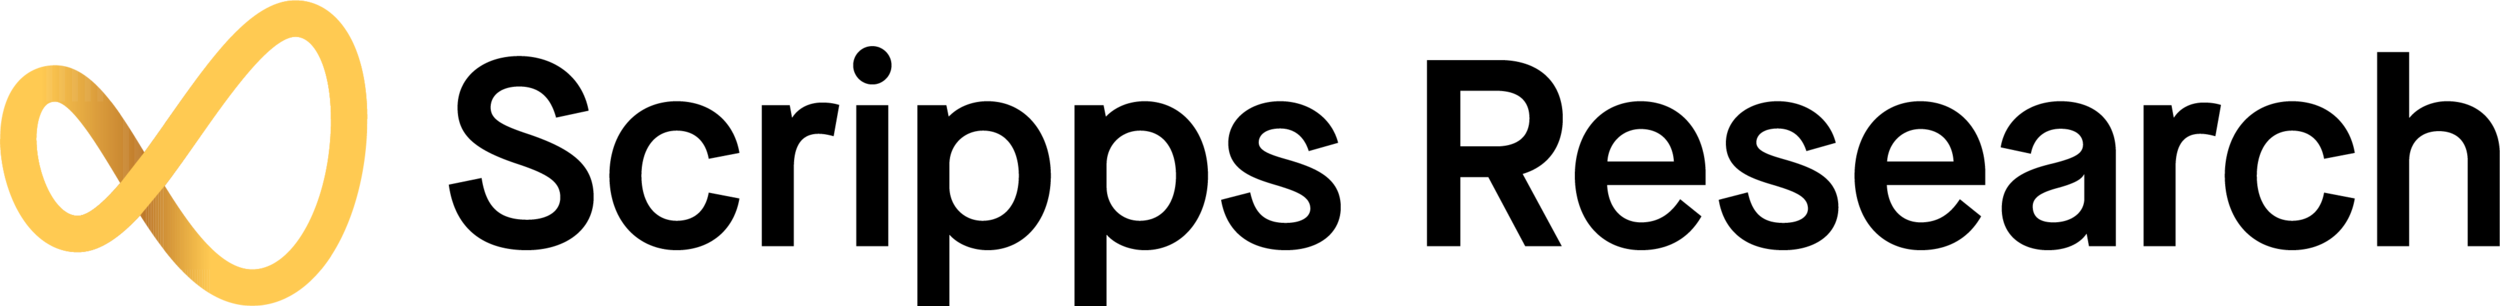 HORIZ_GlowInfinity_BlackText_Global_Logo.png